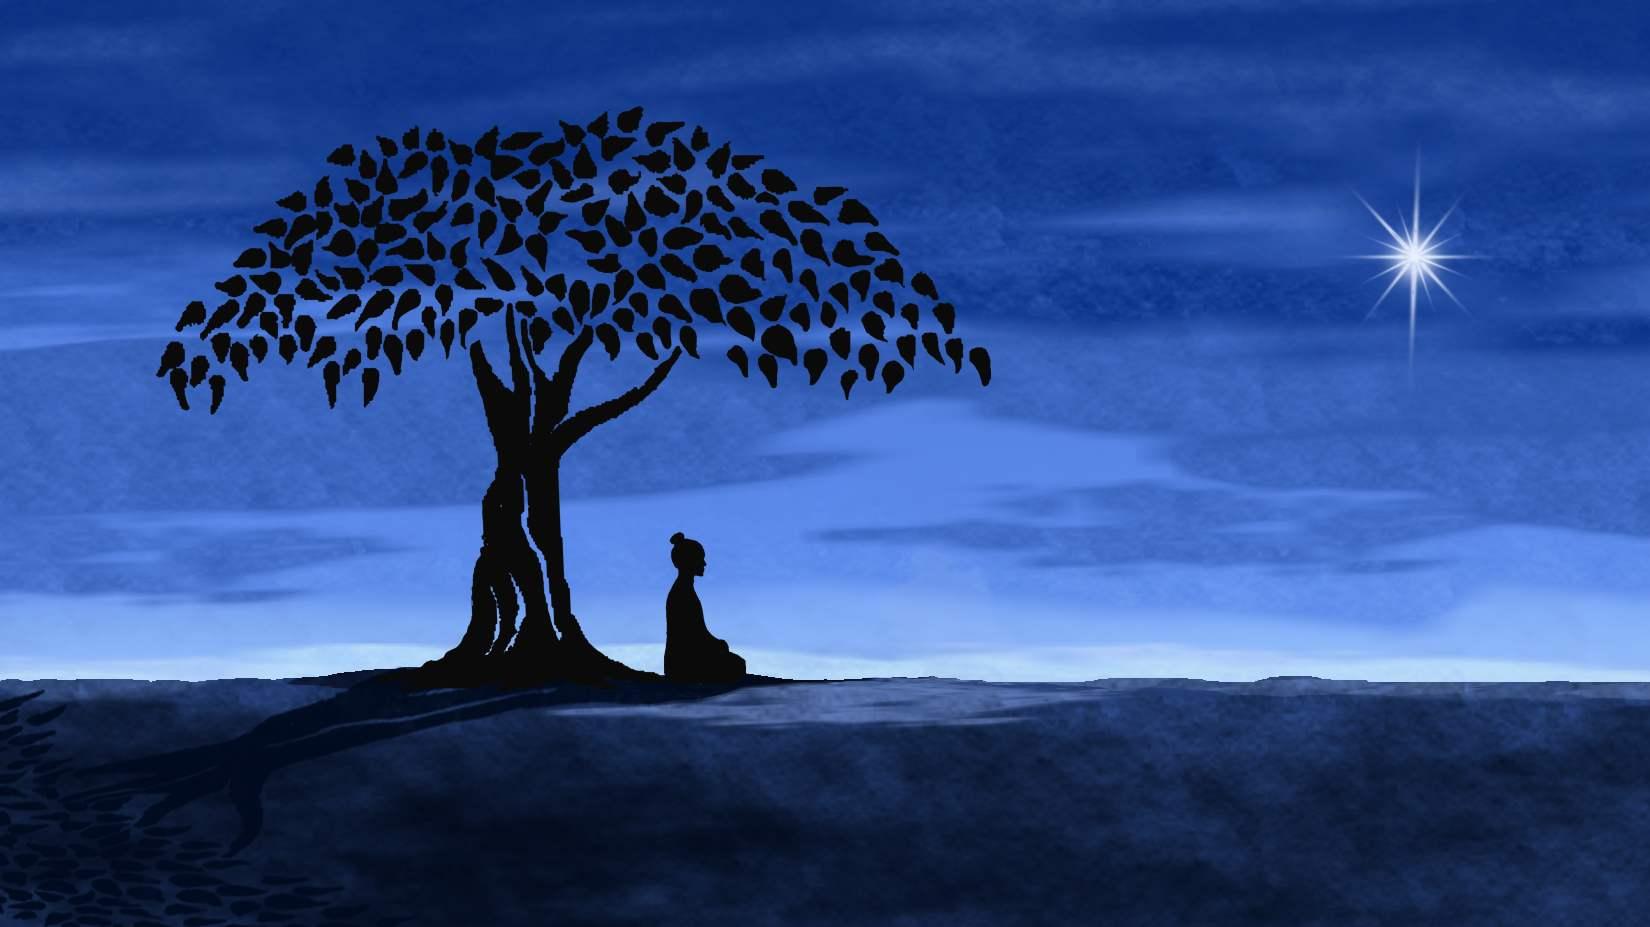 Cinq agrégats, cinq éléments, cinq perfections, cinq sagesses M%C3%A9diation-de-Bouddha